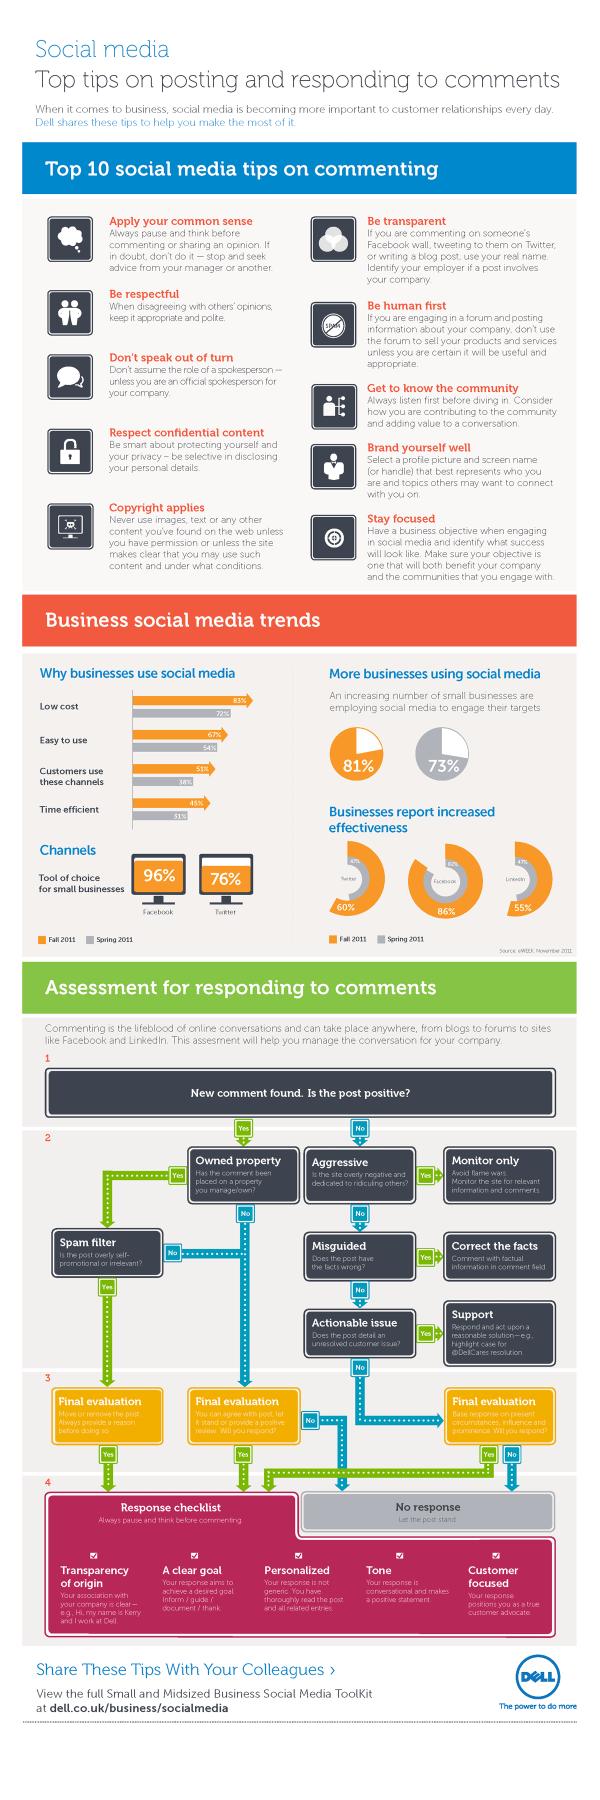 Social Media Tips on Commenting resized 600